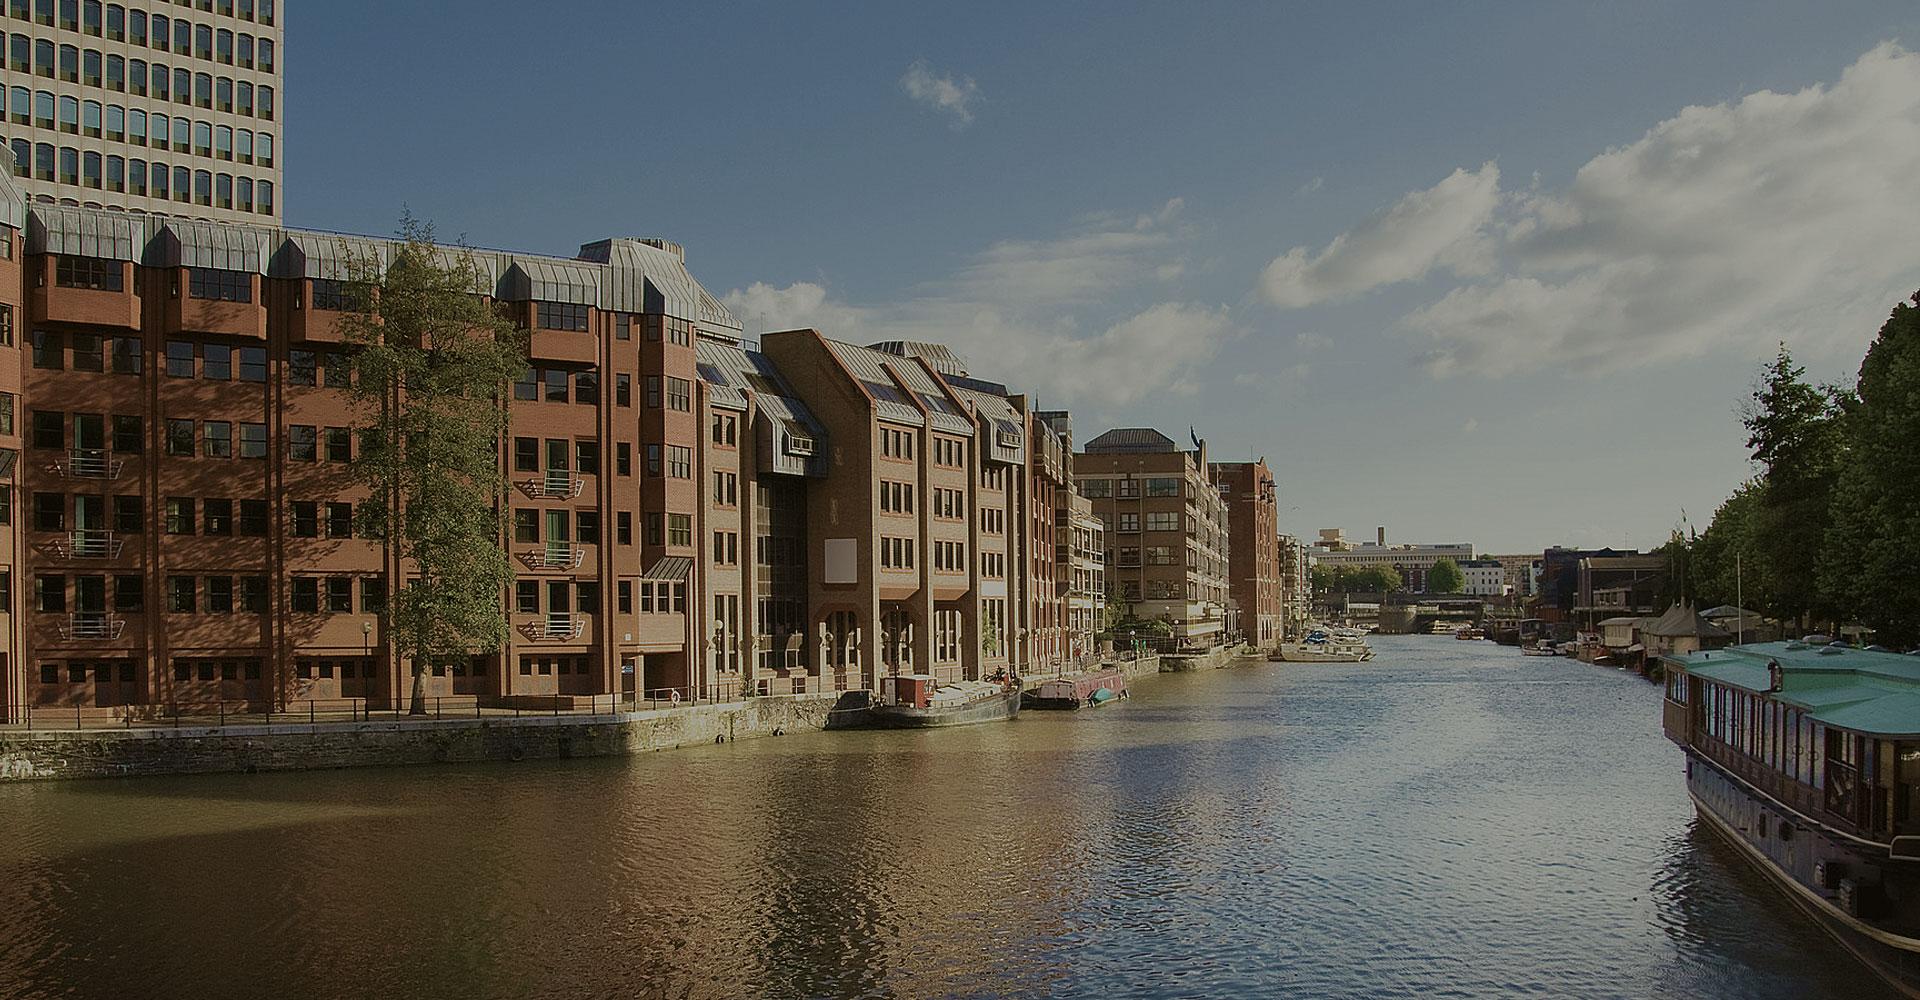 Chartered Building Surveyor in Newcastle upon Tyne